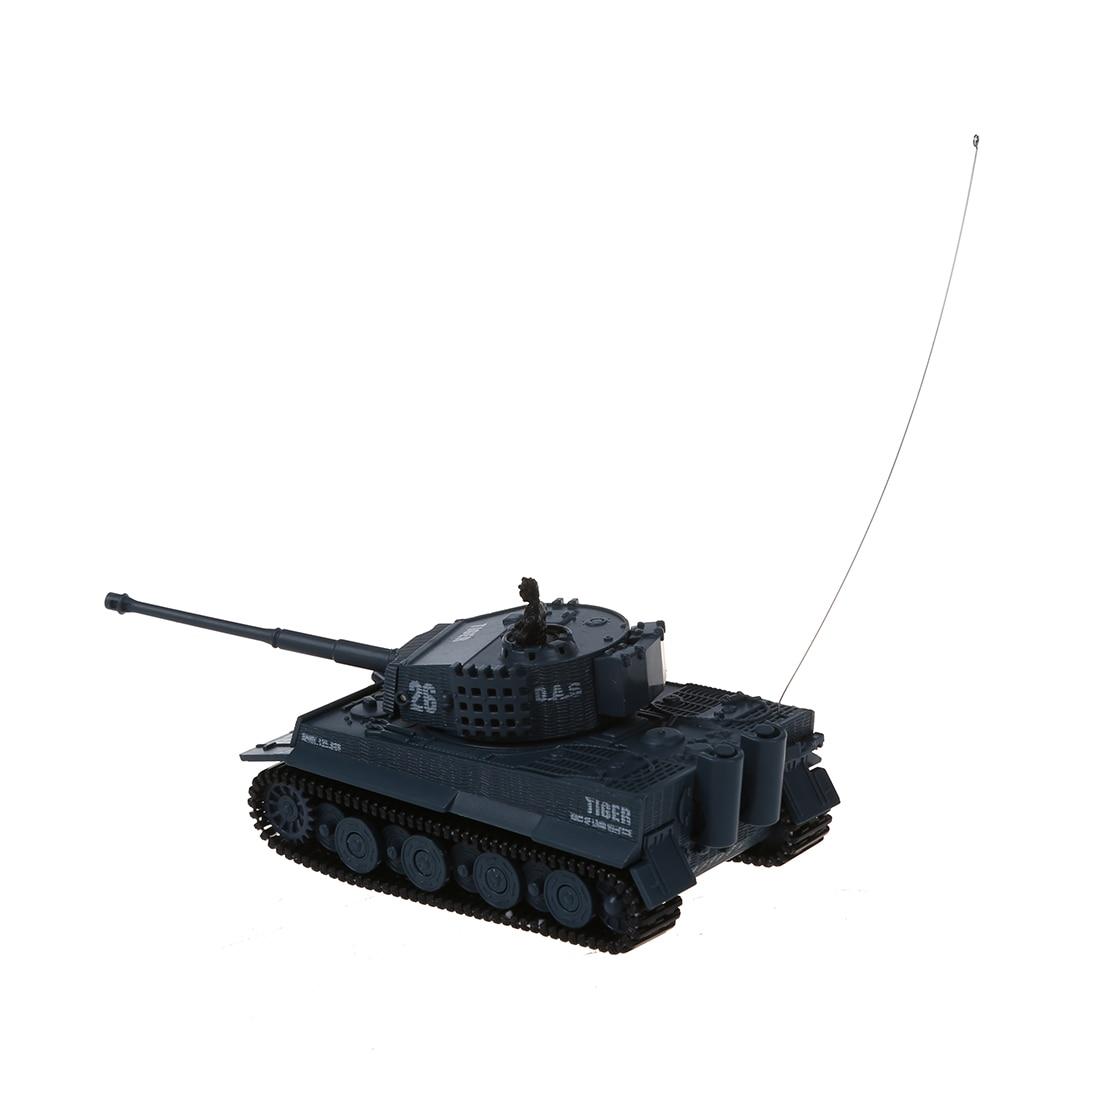 New tanks on radio control Mini 1:72 49MHz R/C Radio Remote Control Tiger Tank 20M Kids Toy Gift Army (Grey)